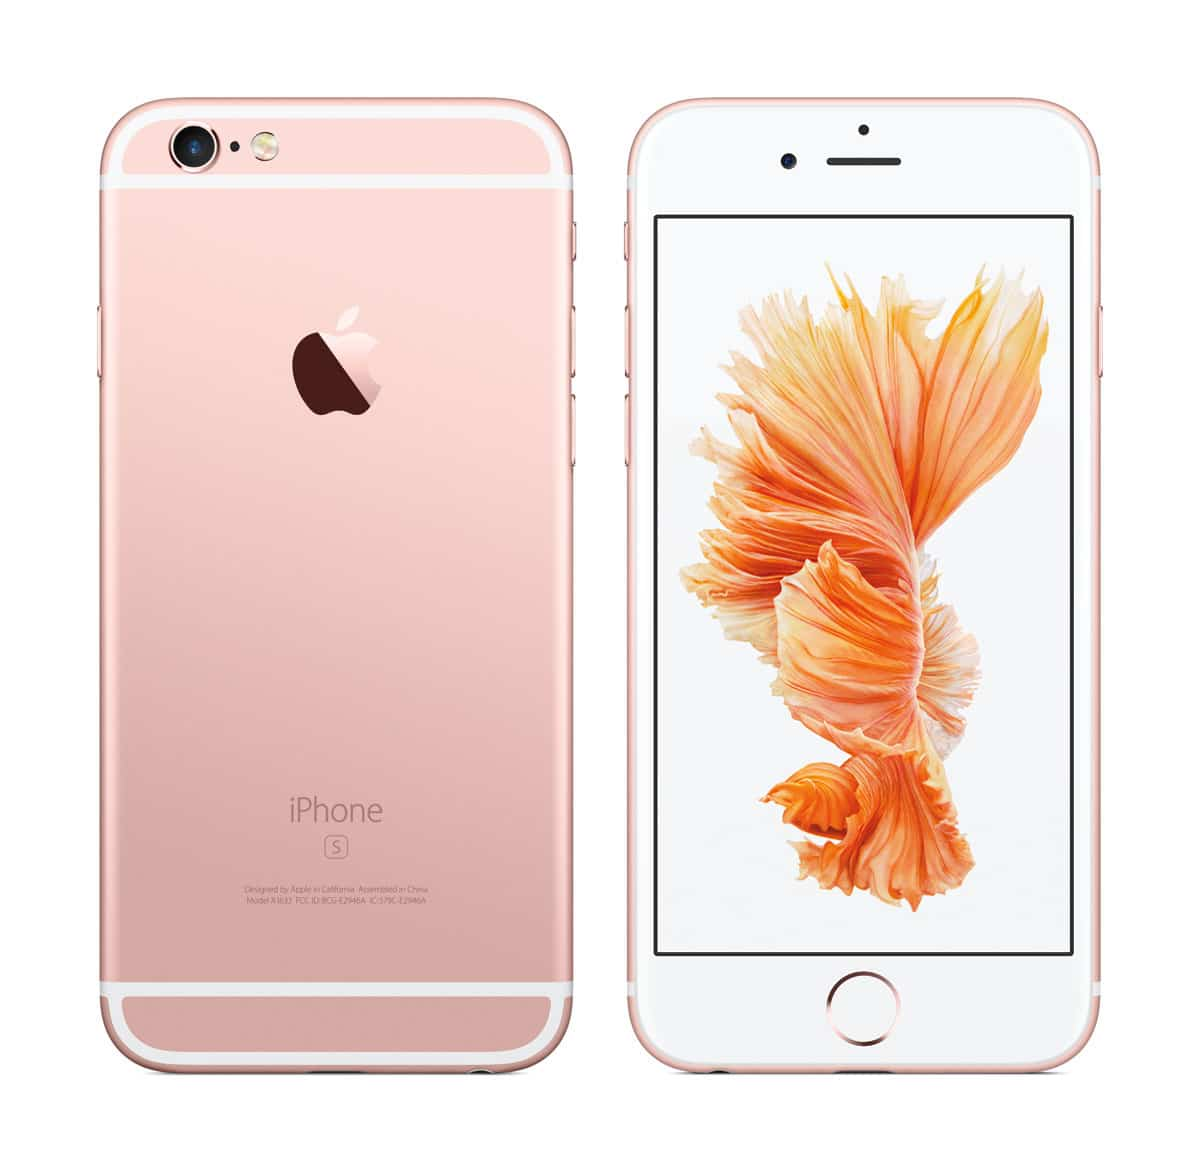 nuevo iphone 6 s